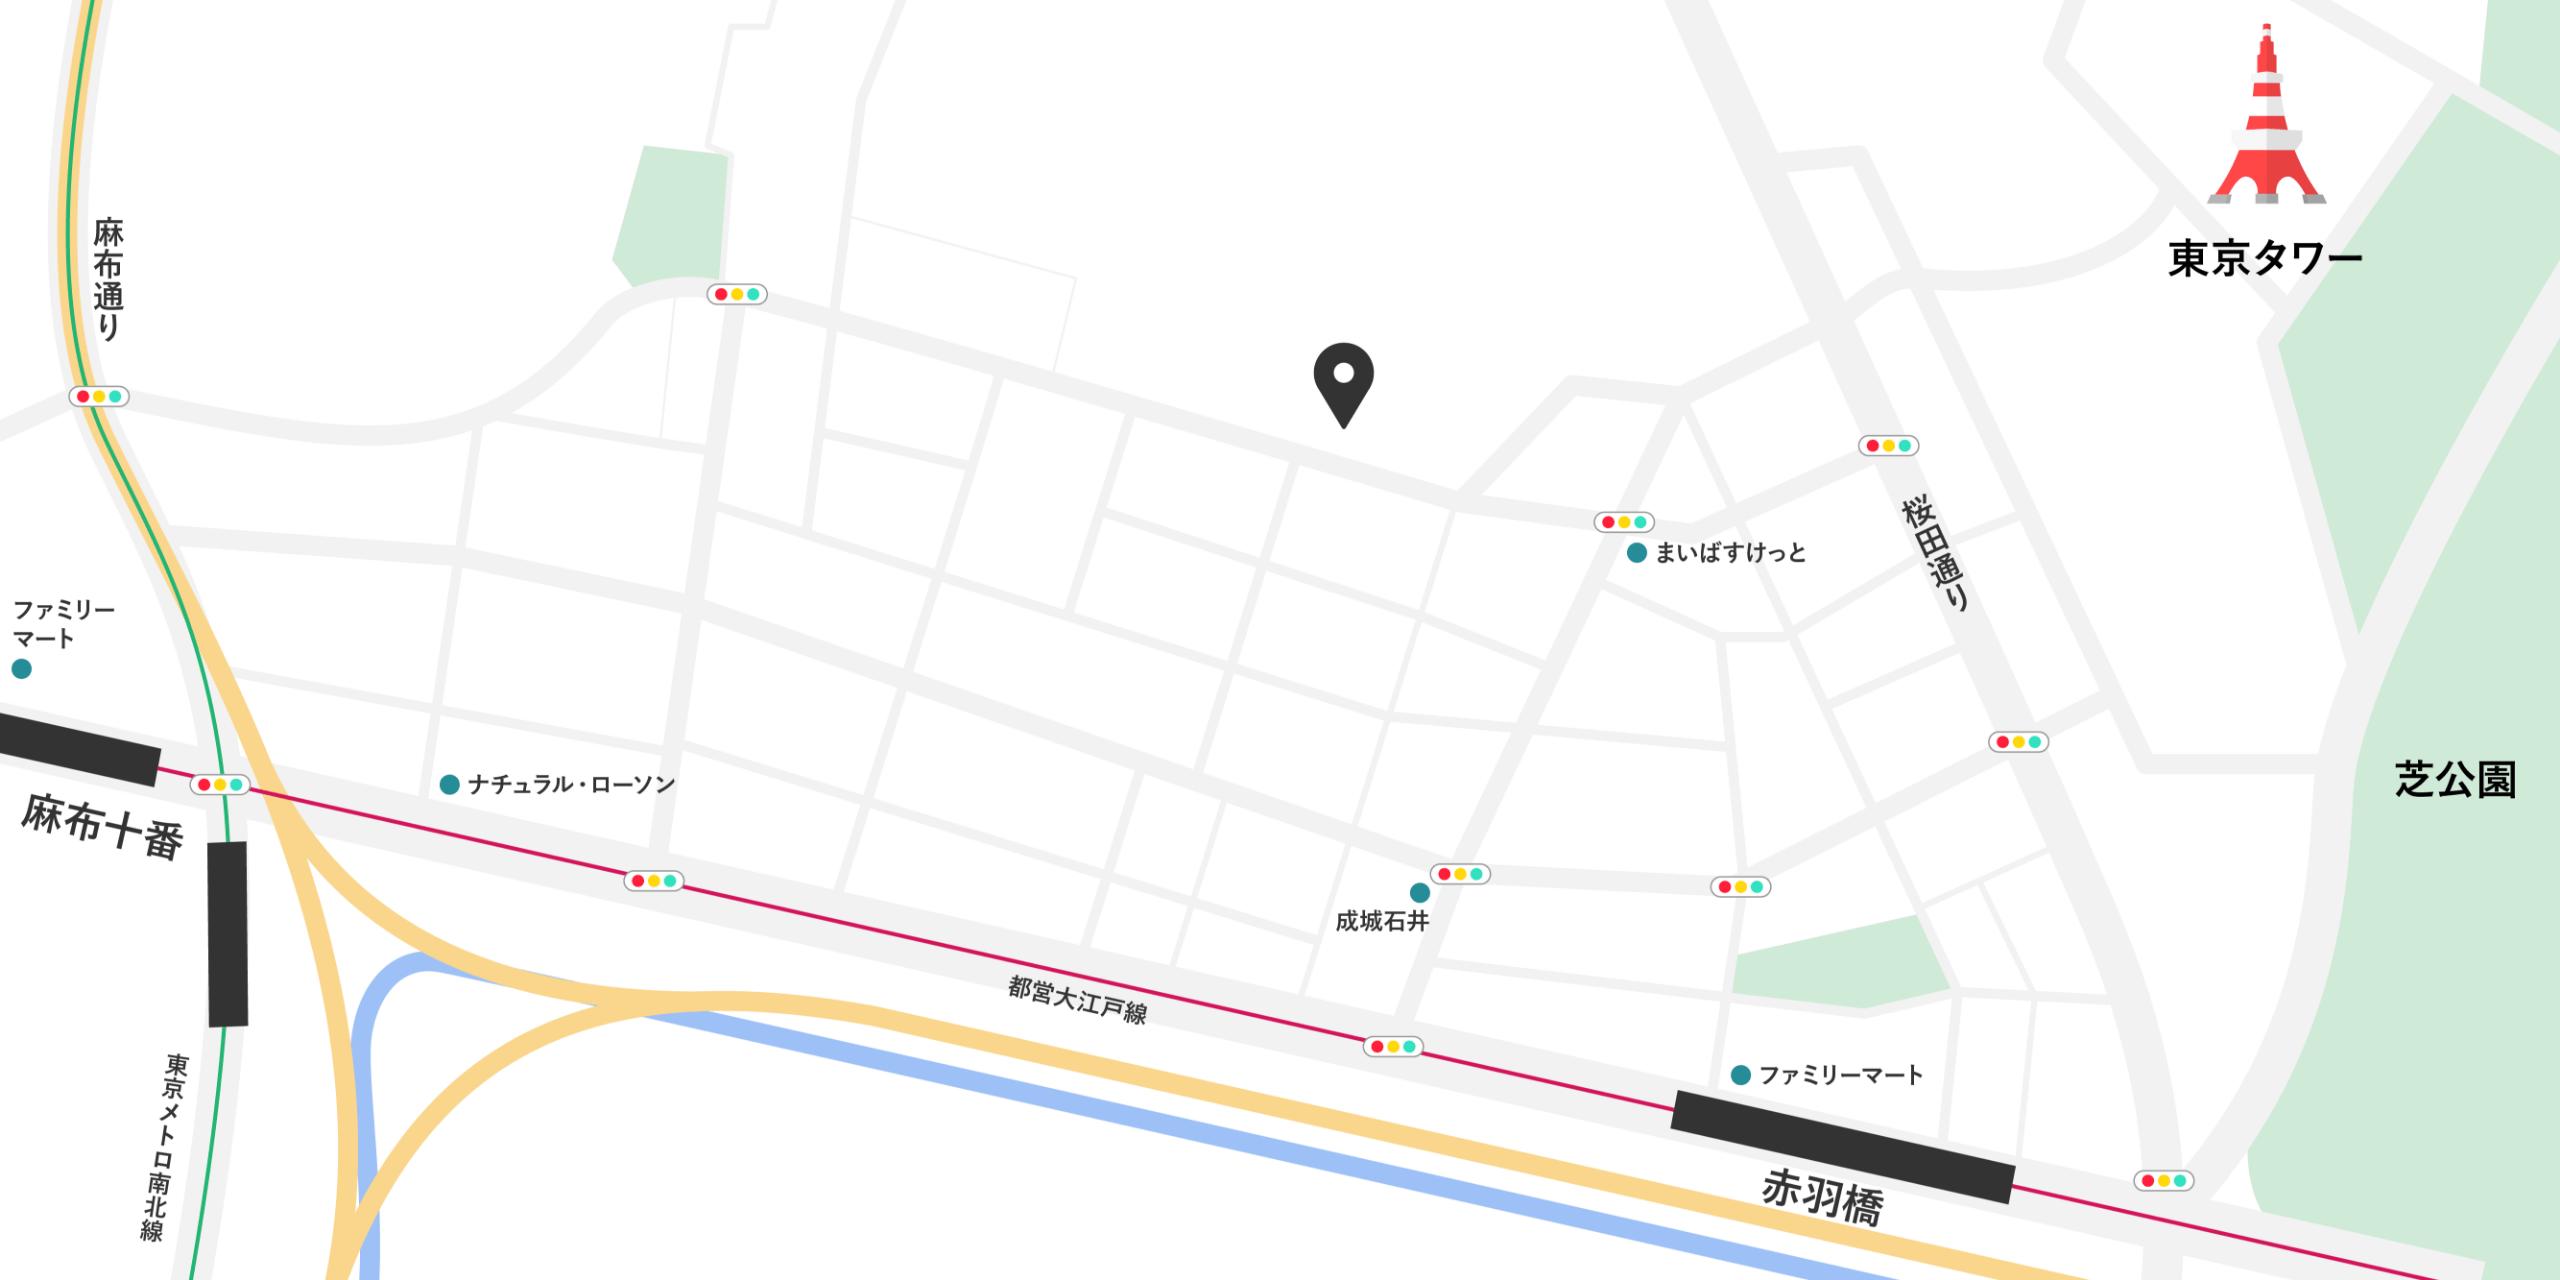 東京都港区東麻布2-6-5 Tuttle Bldg 4F-WESTの地図